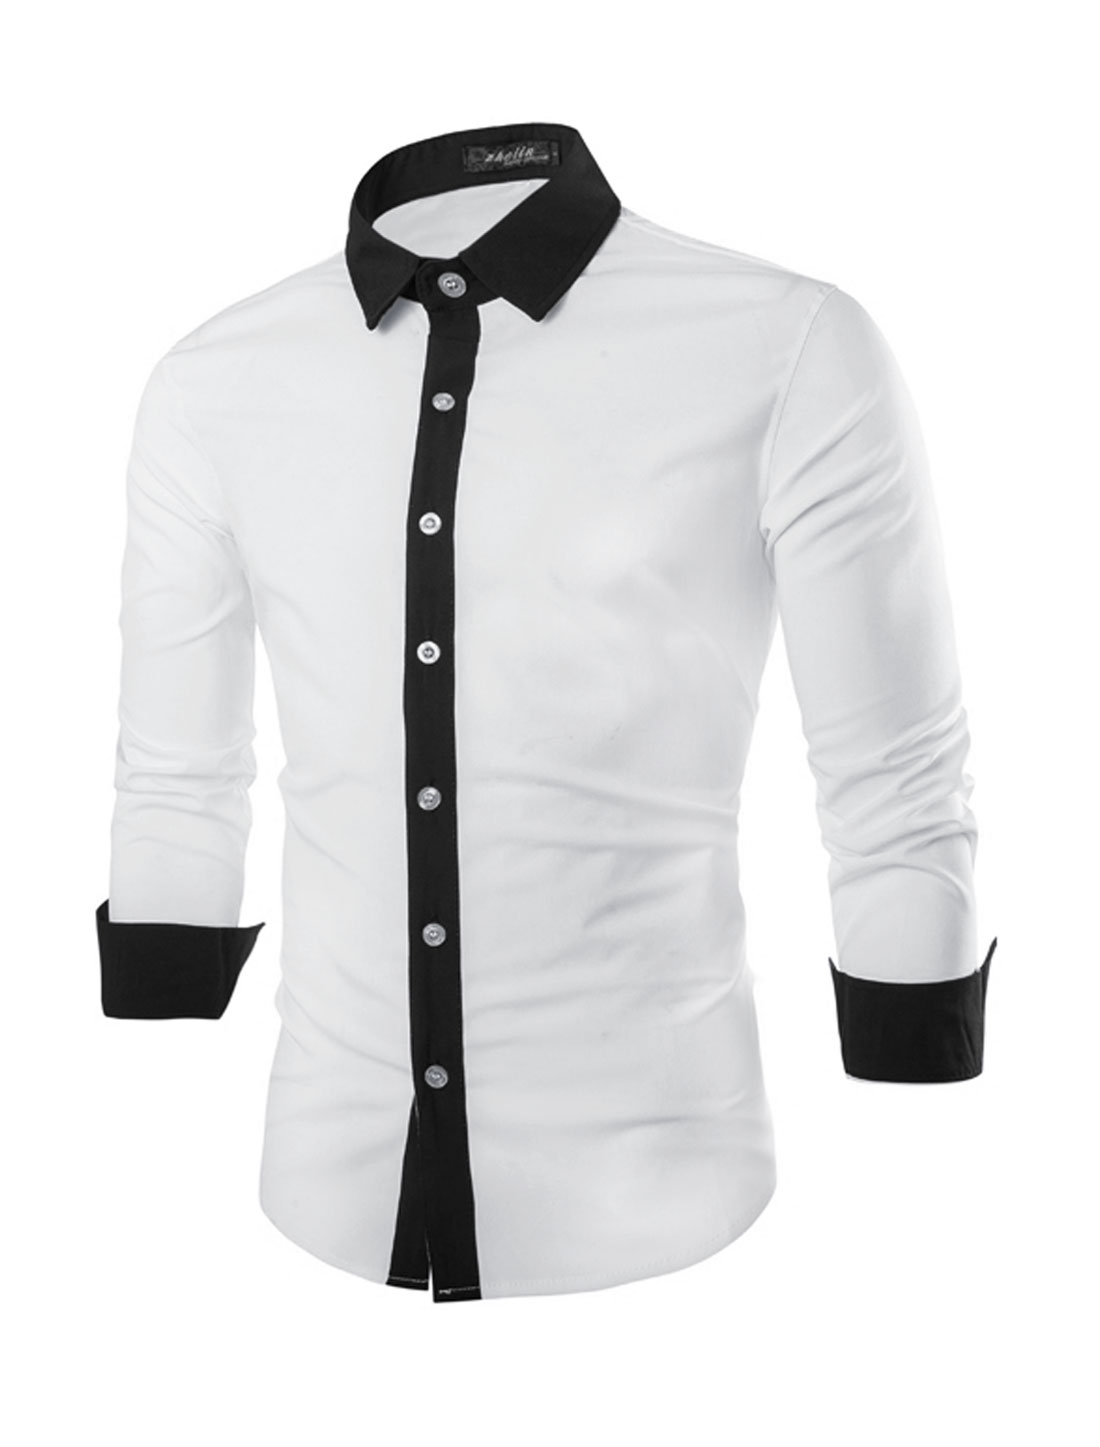 Men Long Sleeve Button Down Contrast Detail Shirt White Black M